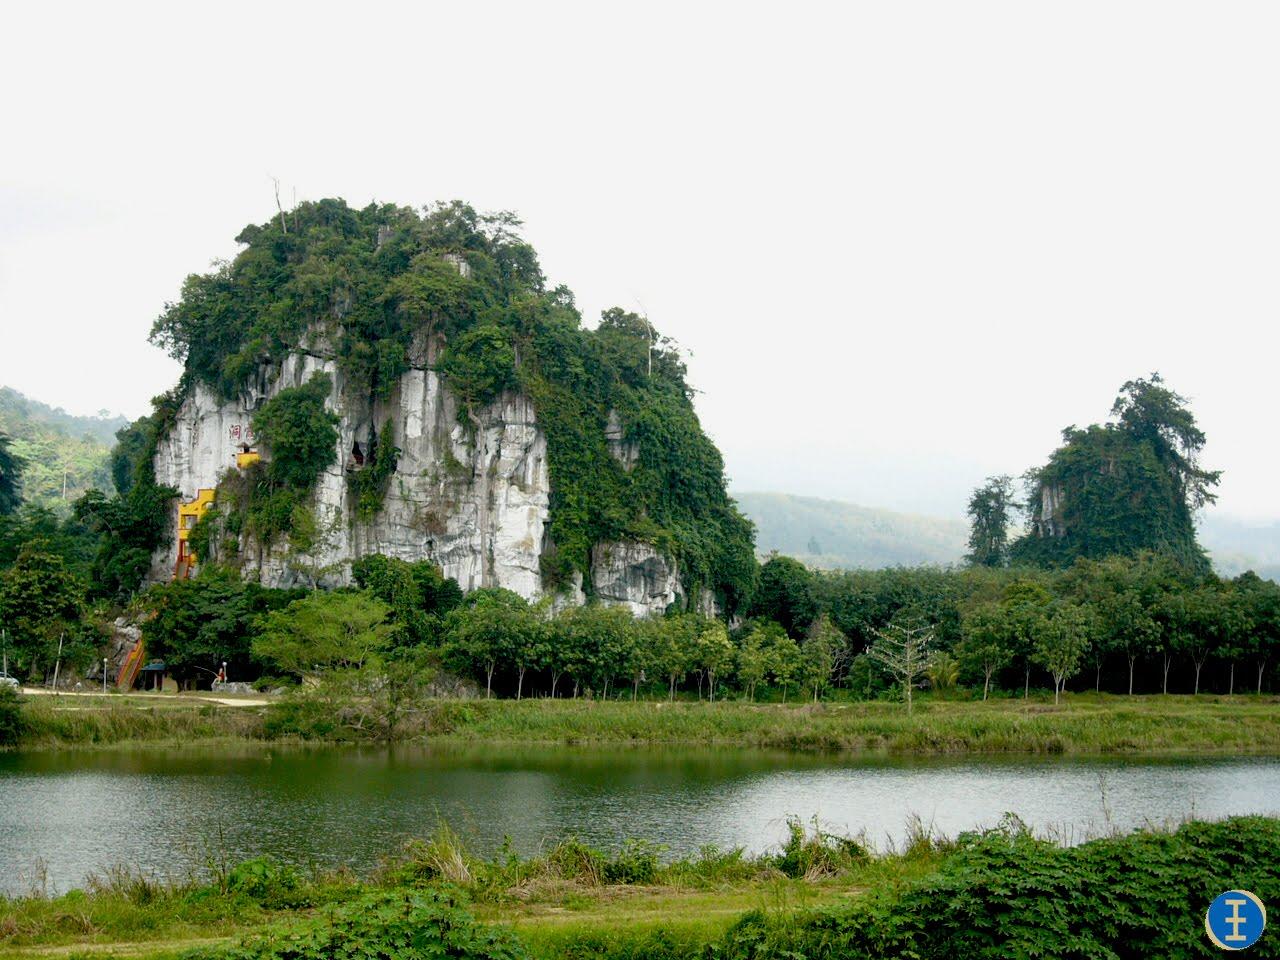 Gua Musang Malaysia  city photos gallery : ... . Beautiful Living.: Gua Musang Cave of Fox, Kelantan, Malaysia